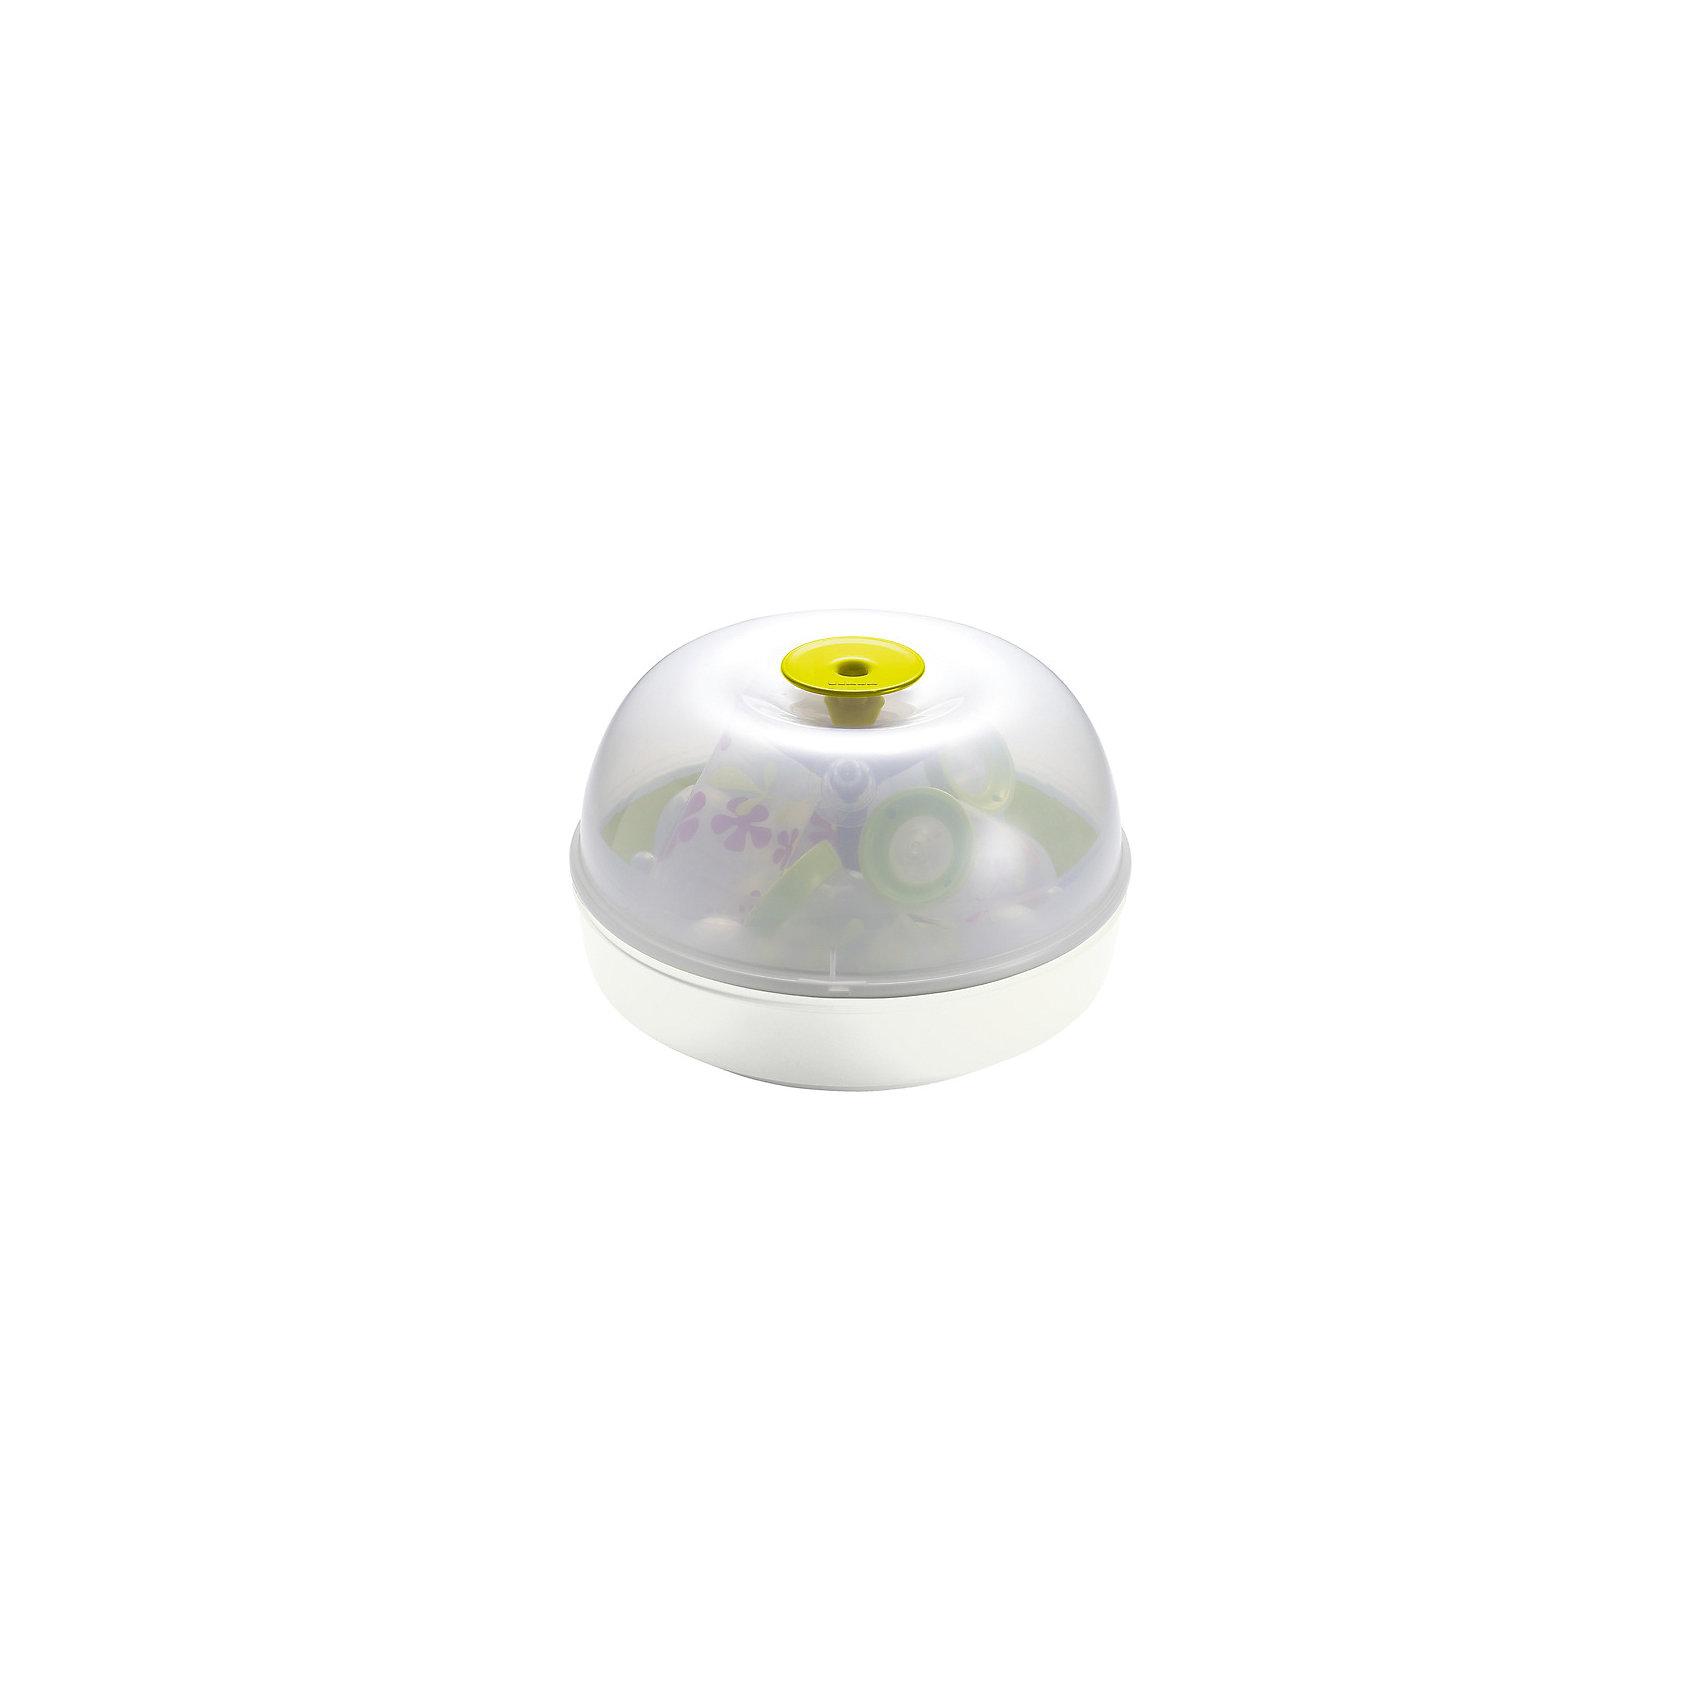 BEABA Стерилизатор (для микроволновой печи), Beaba, NEON